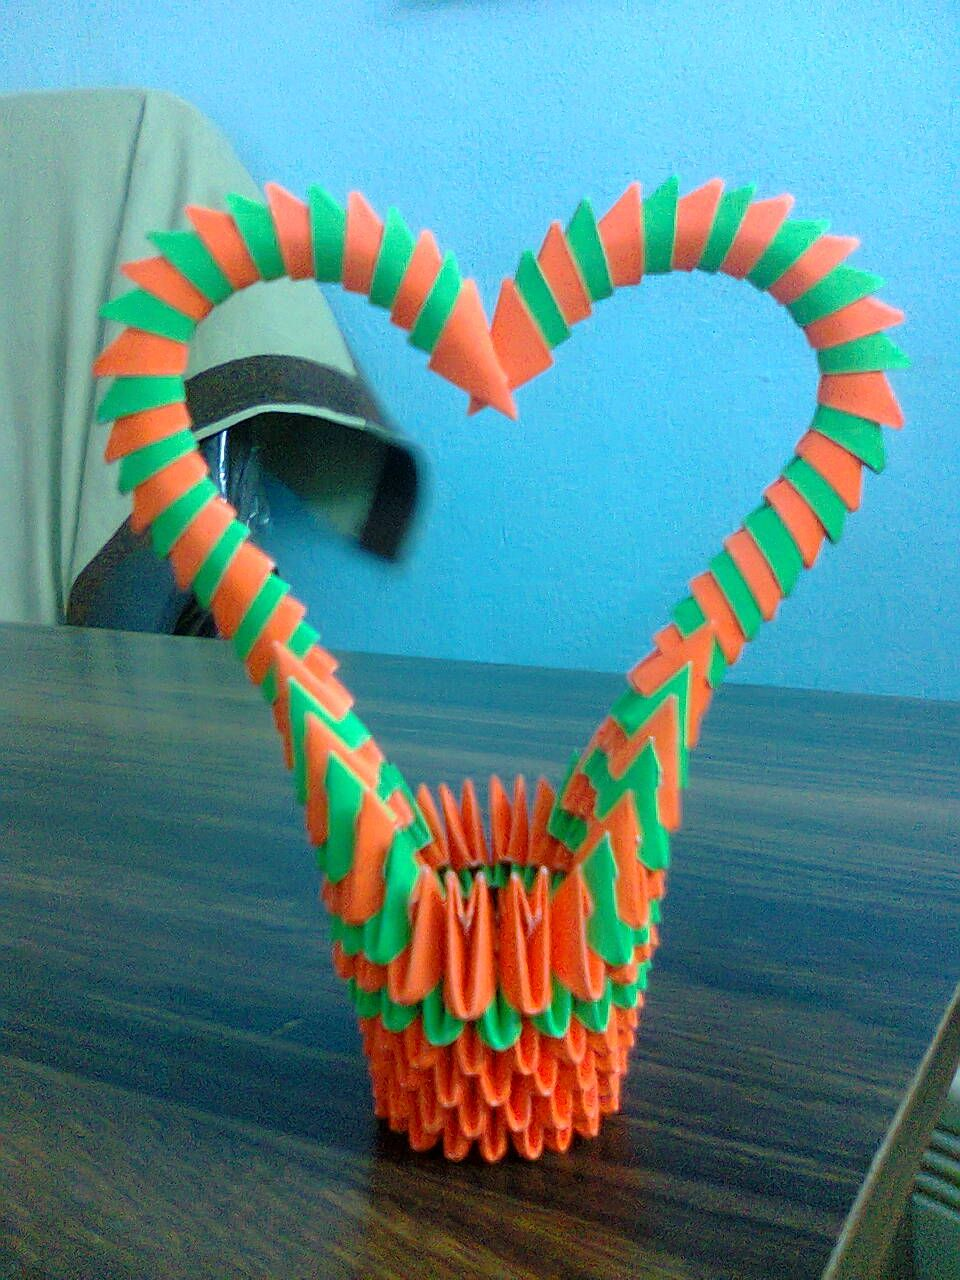 3d origami heart shape basket 3d origami arts pinterest 3d 3d origami heart shape basket jeuxipadfo Gallery